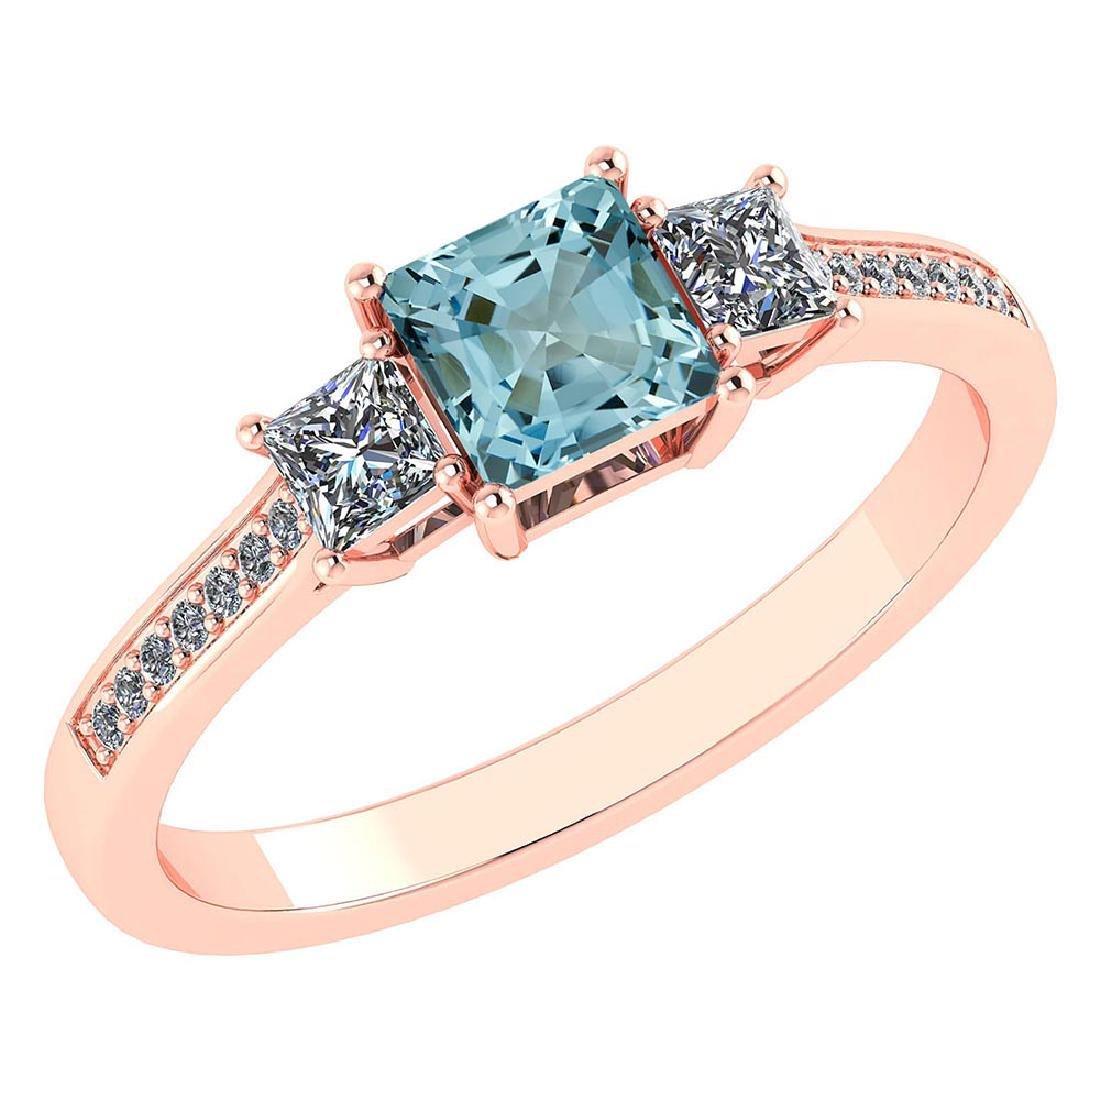 Certified 1.18 CTW Genuine Aquamarine And Diamond 14K R